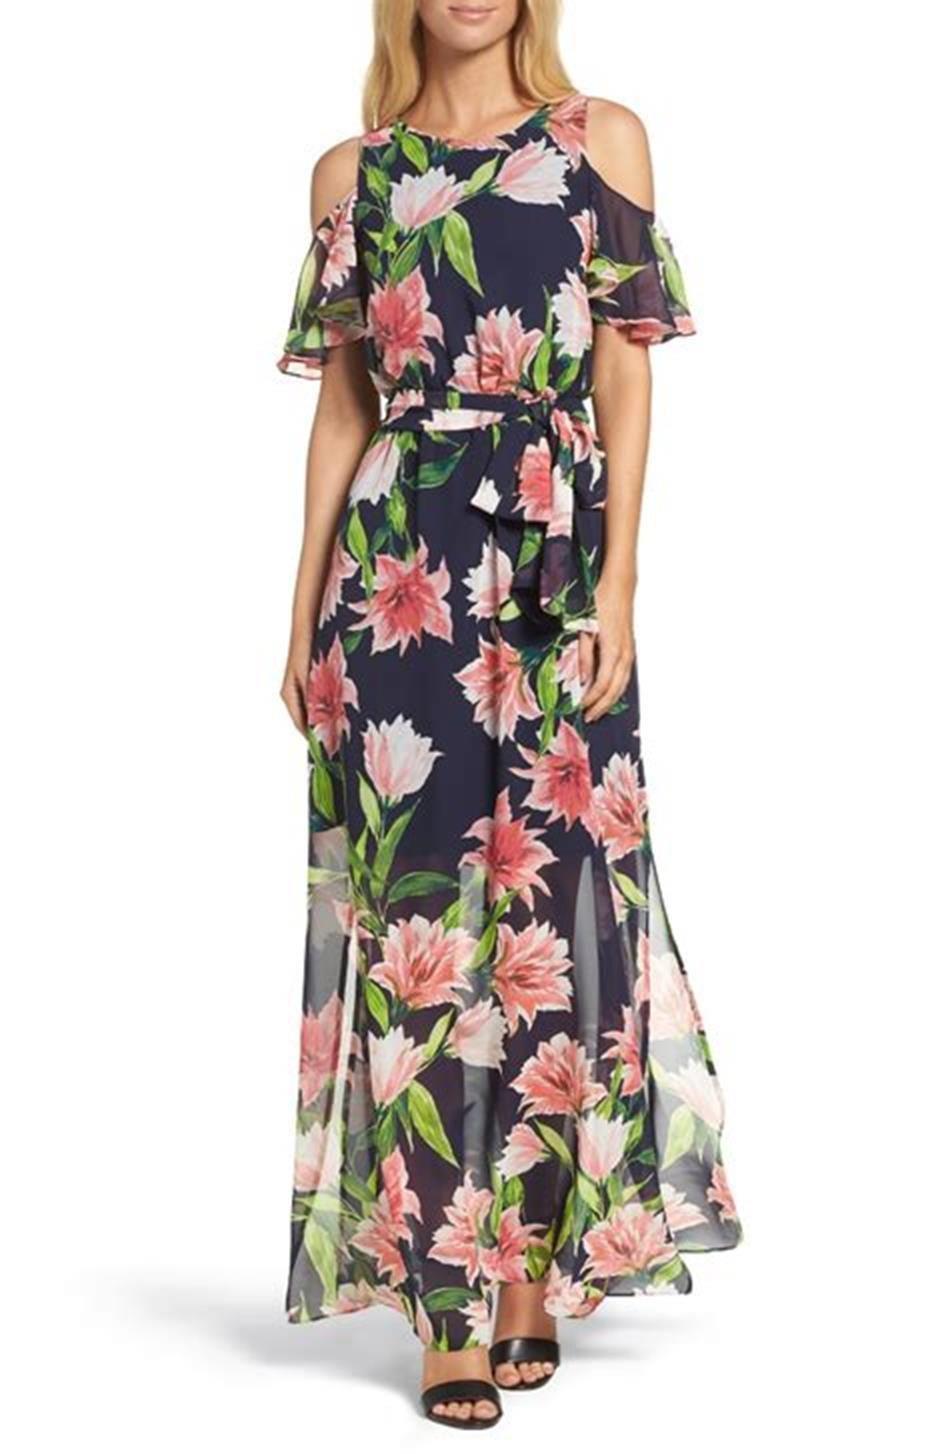 8a557108f362c 35 Cute Spring Wedding Guest Dresses Ideas   All Fashion   Nordstrom ...